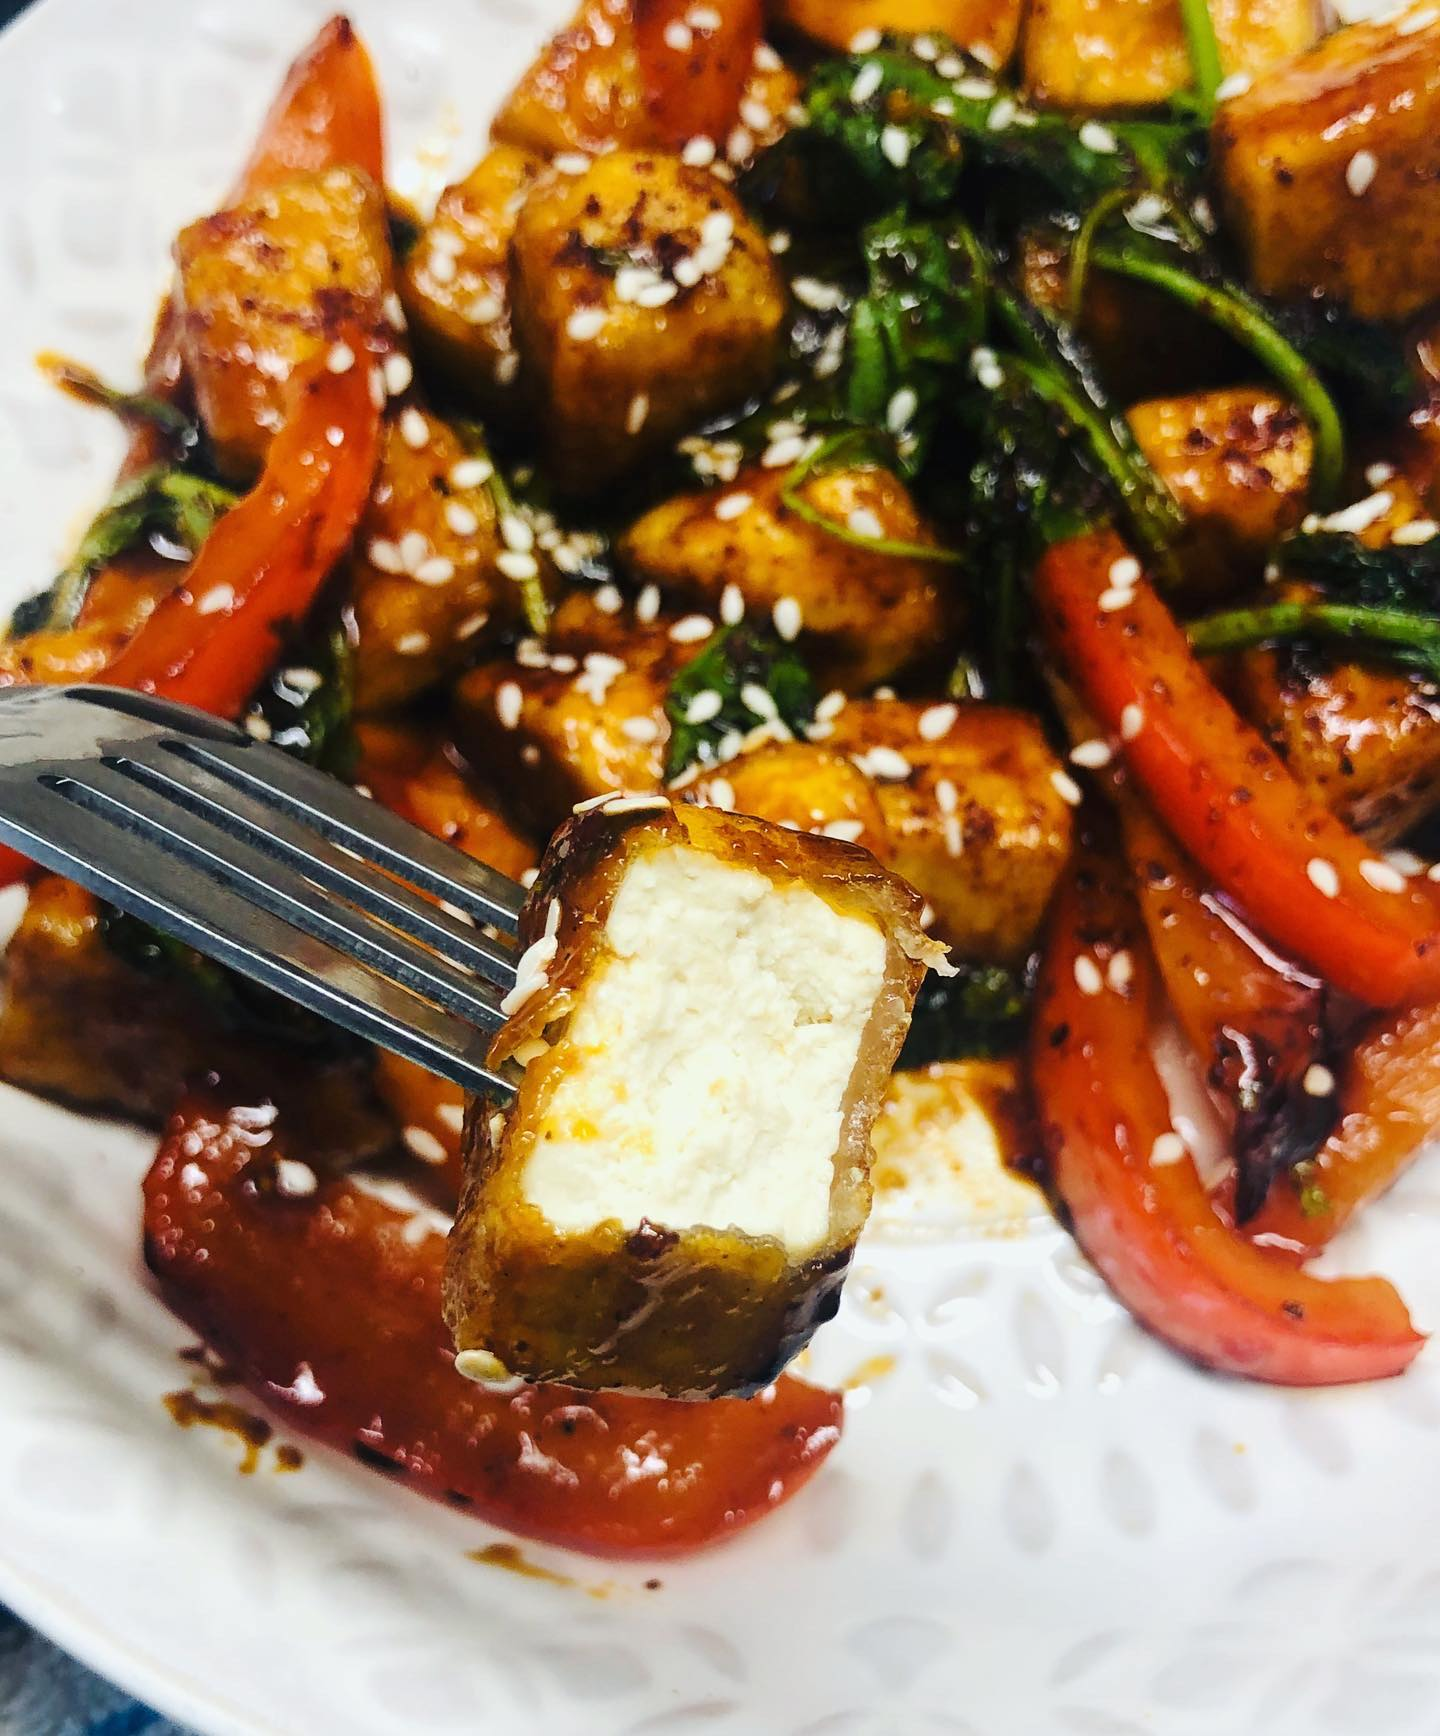 Sticky Pomegranate Glazed Tofu Stir-Fry